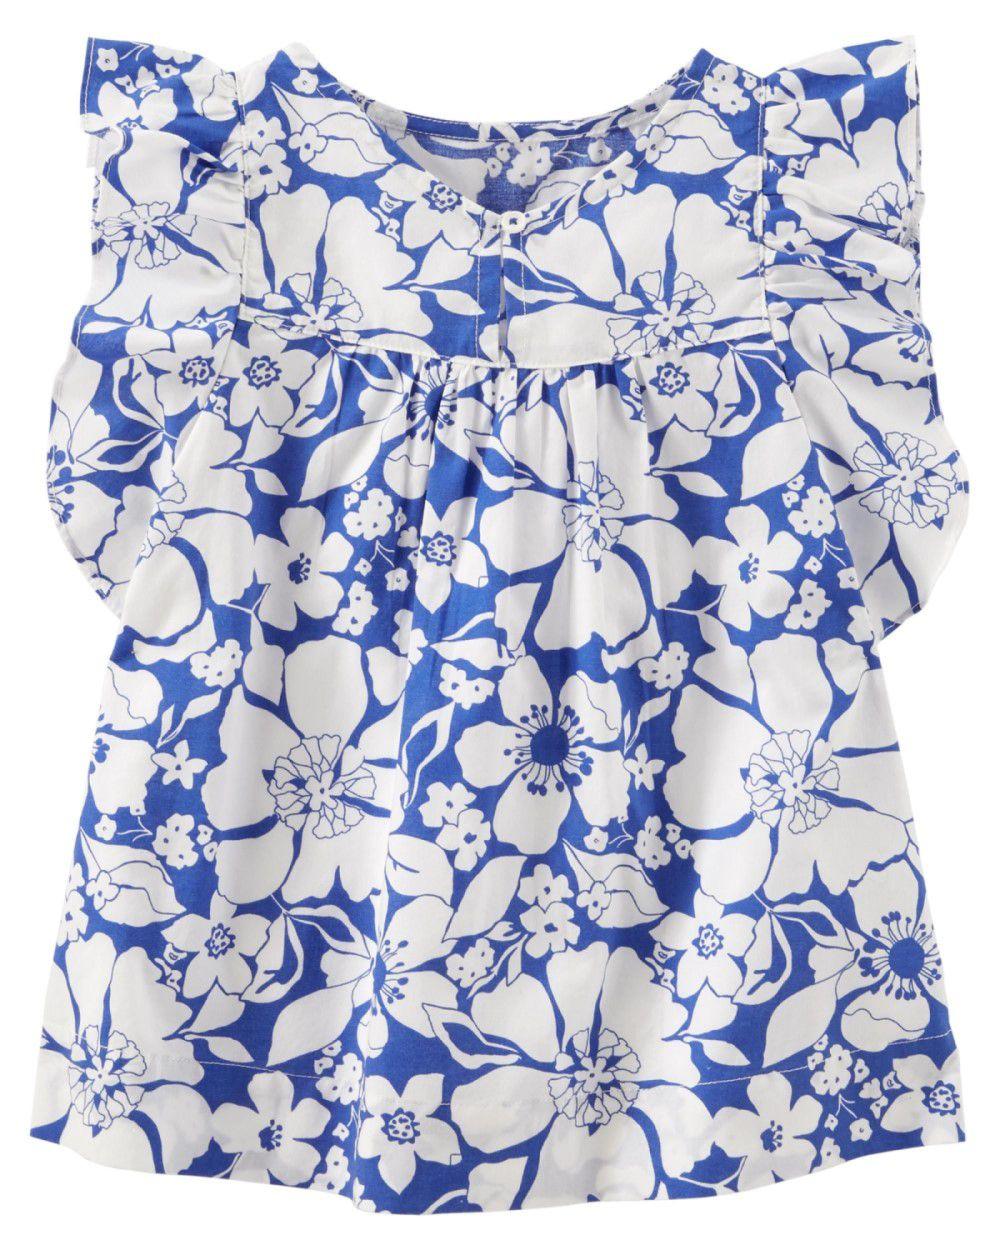 Bata Azul e Branco Floral OshKosh